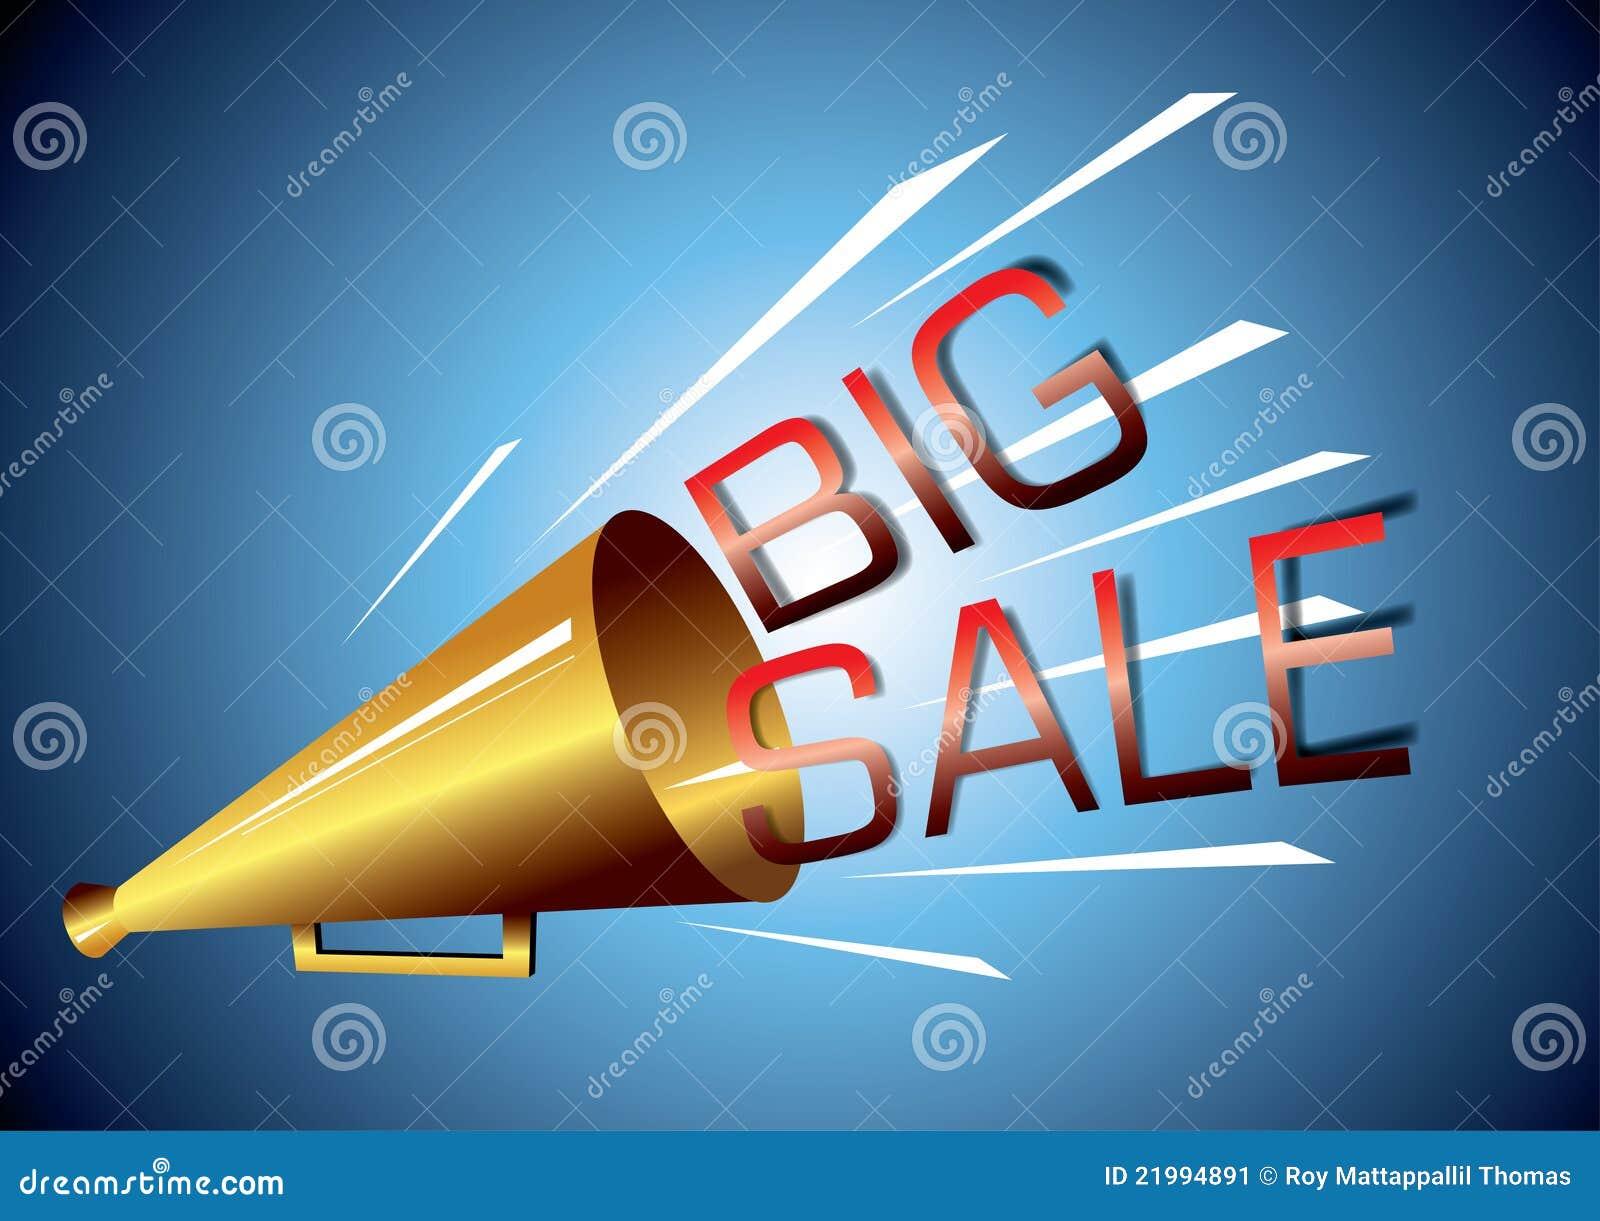 big sale announcement stock image image 21994891